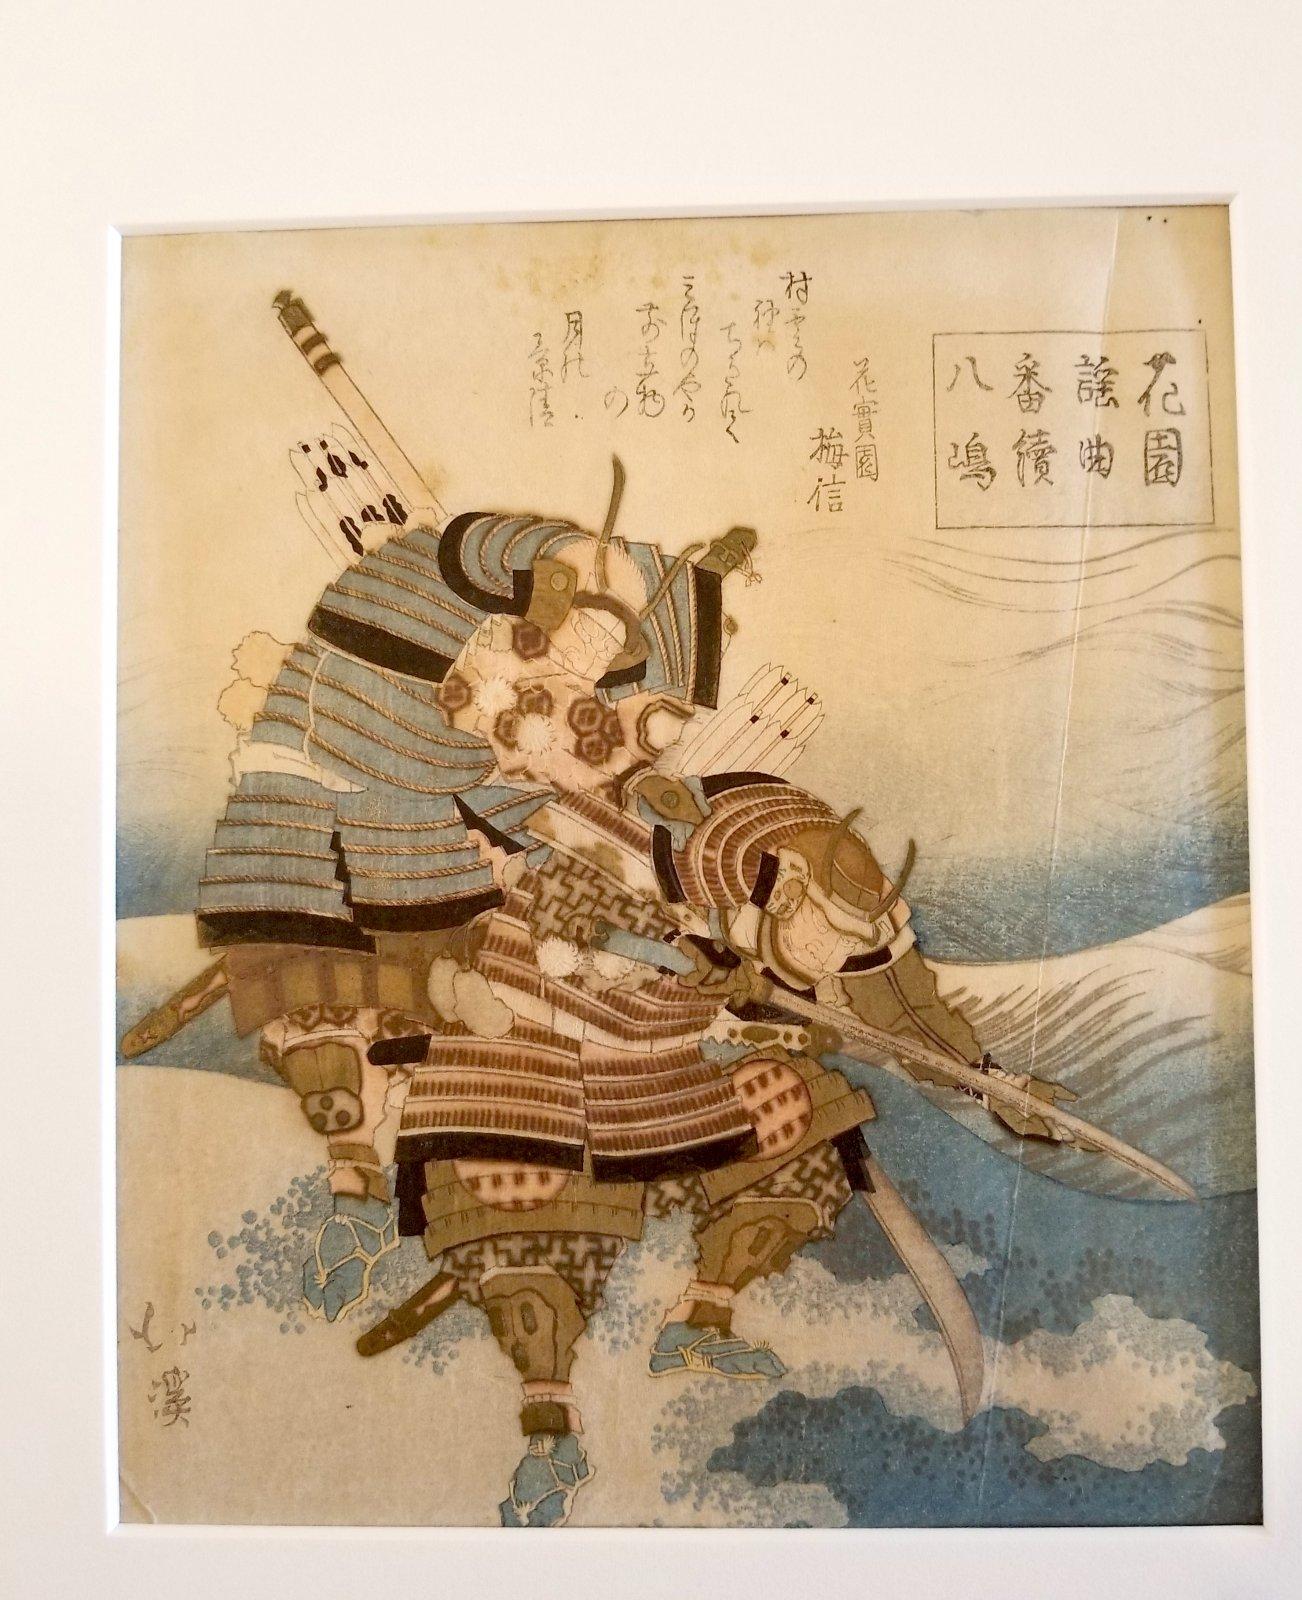 Japanese wood block print of Samurai fighting